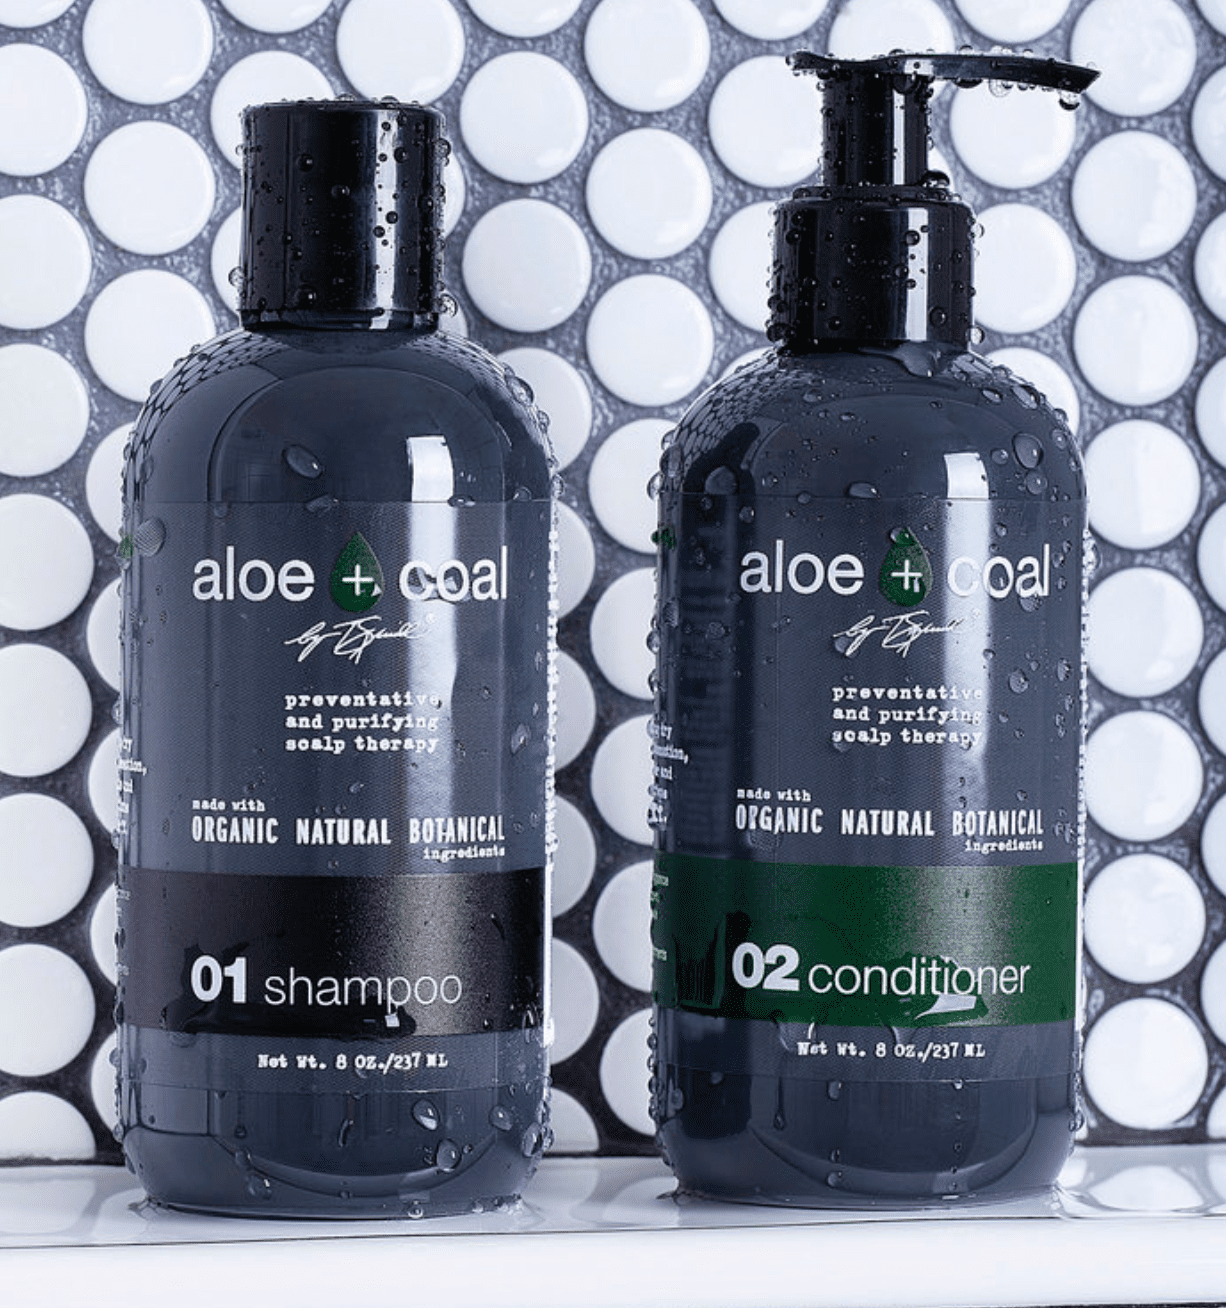 Aloe + Coal Shampoo and Conditioner Set